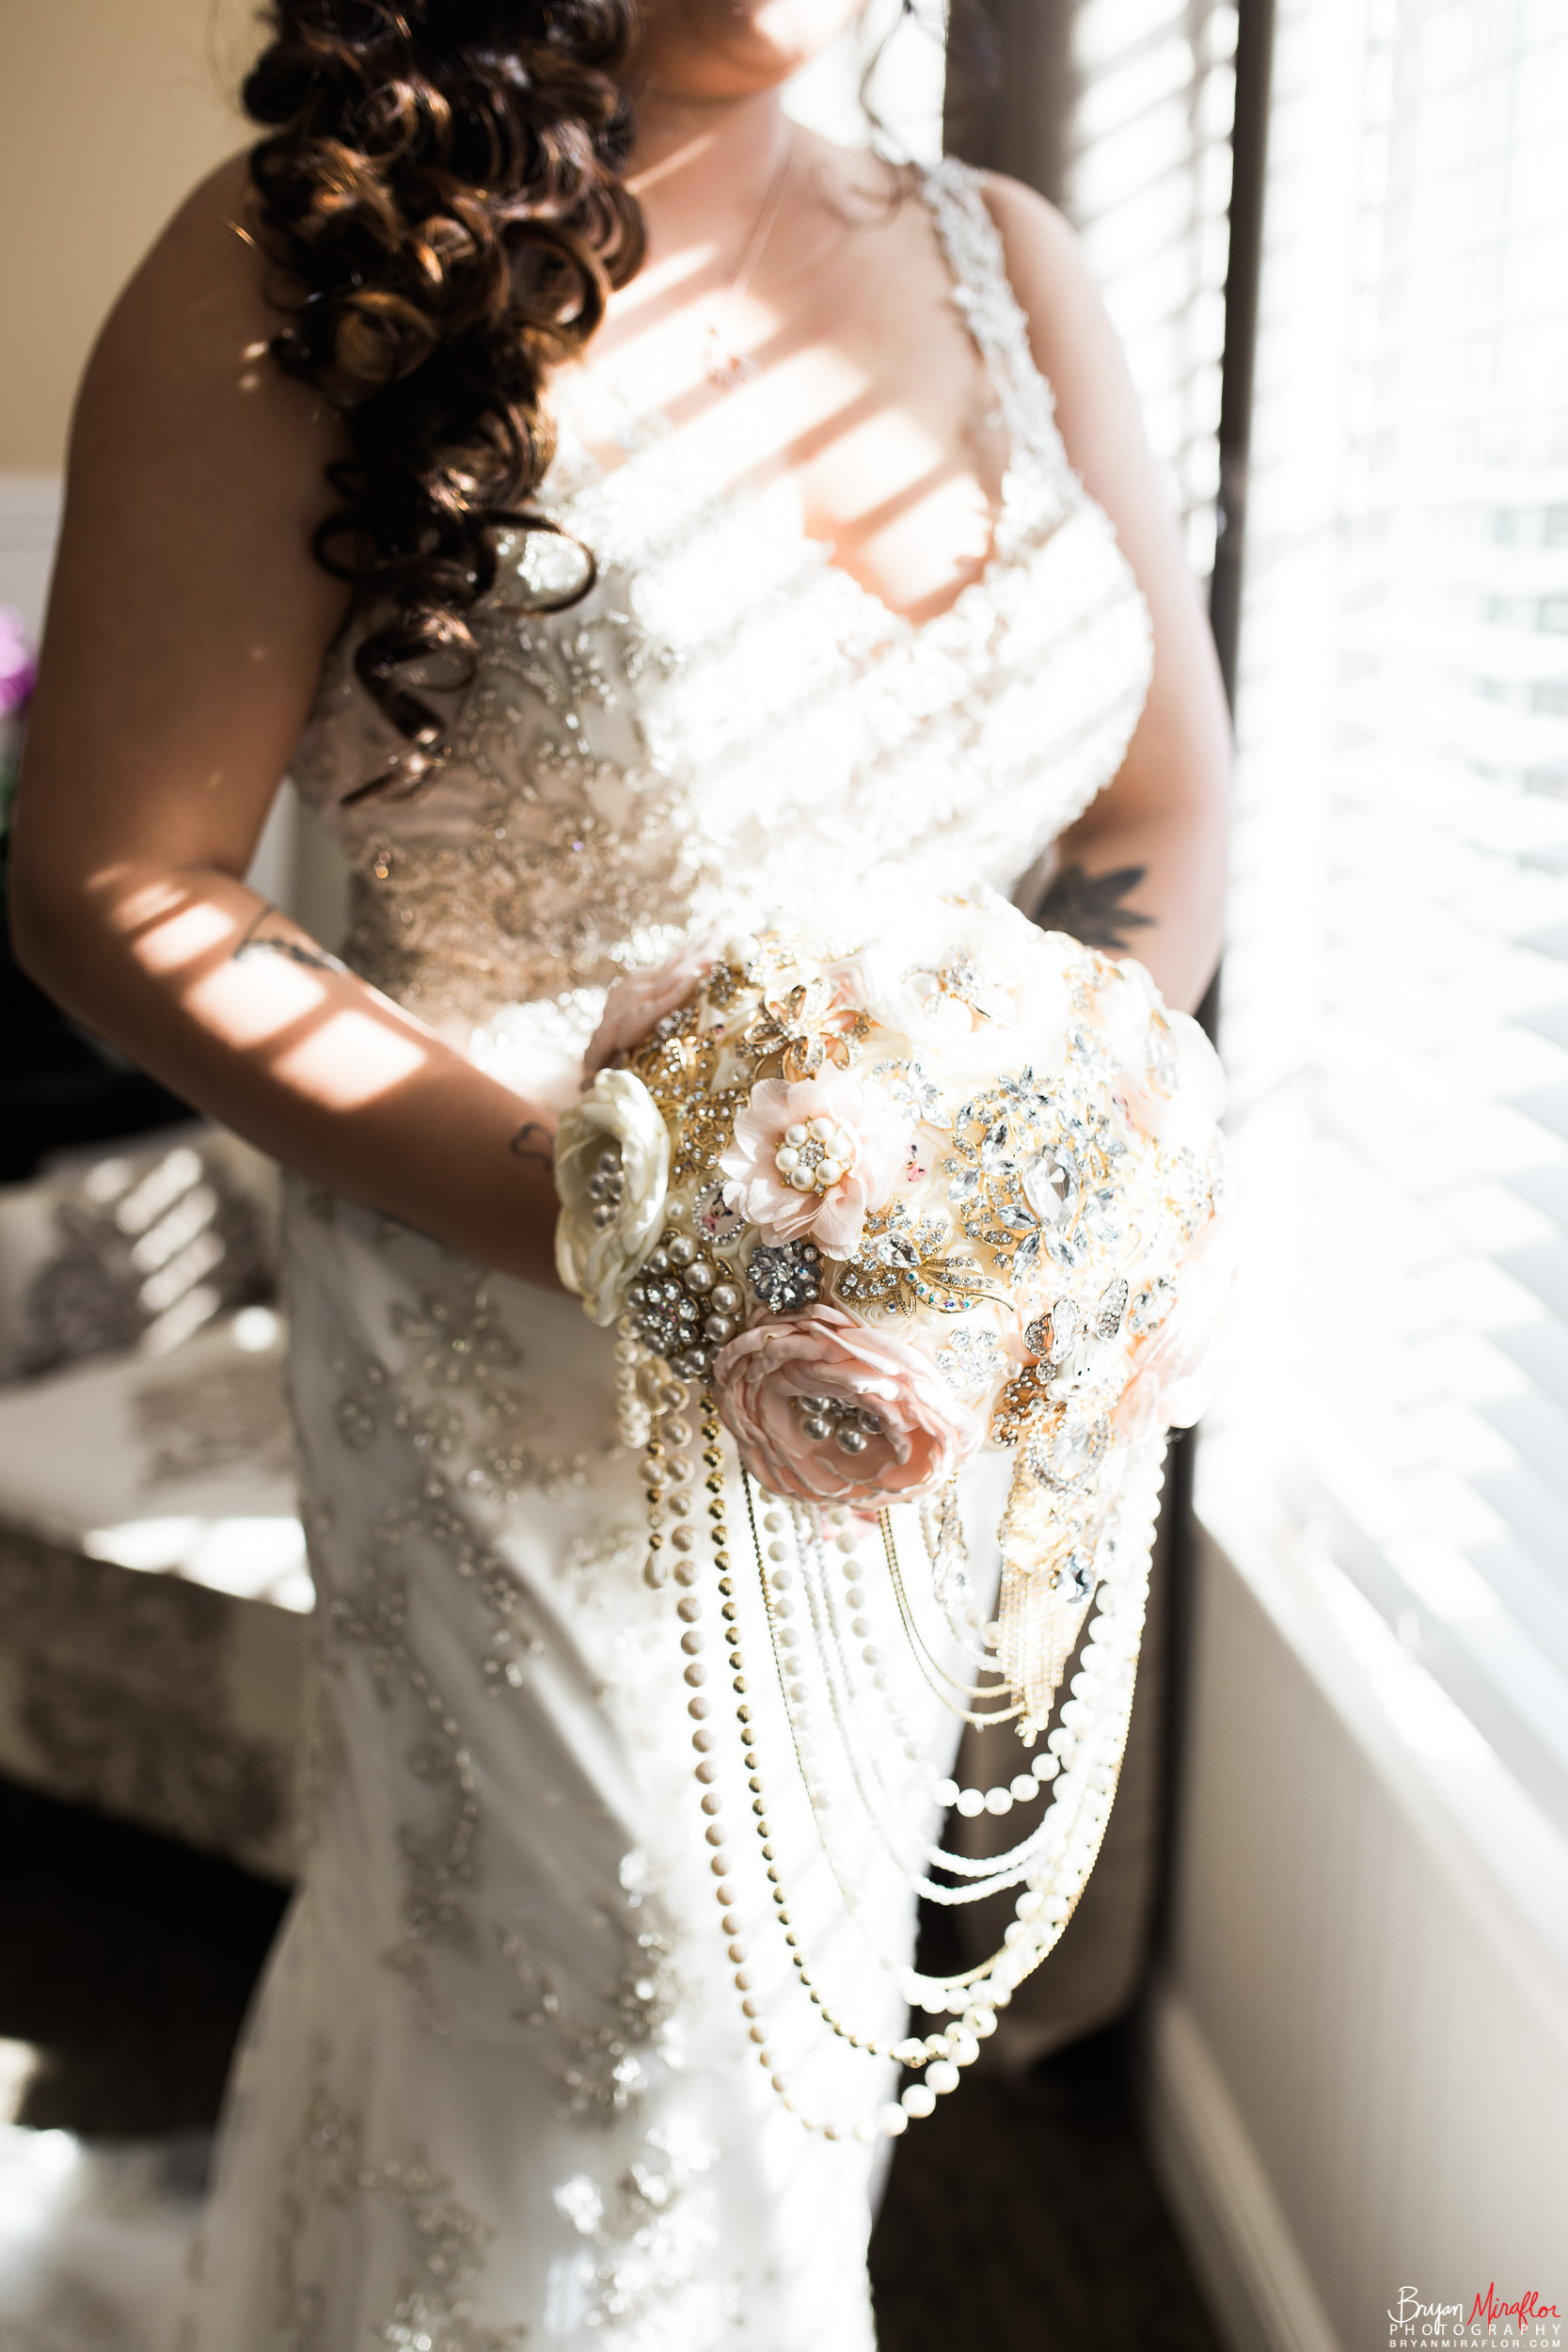 Bryan-Miraflor-Photography-Hannah-Jonathan-Married-Grand-Traditions-Estate-Gardens-Fallbrook-20171222-040.jpg